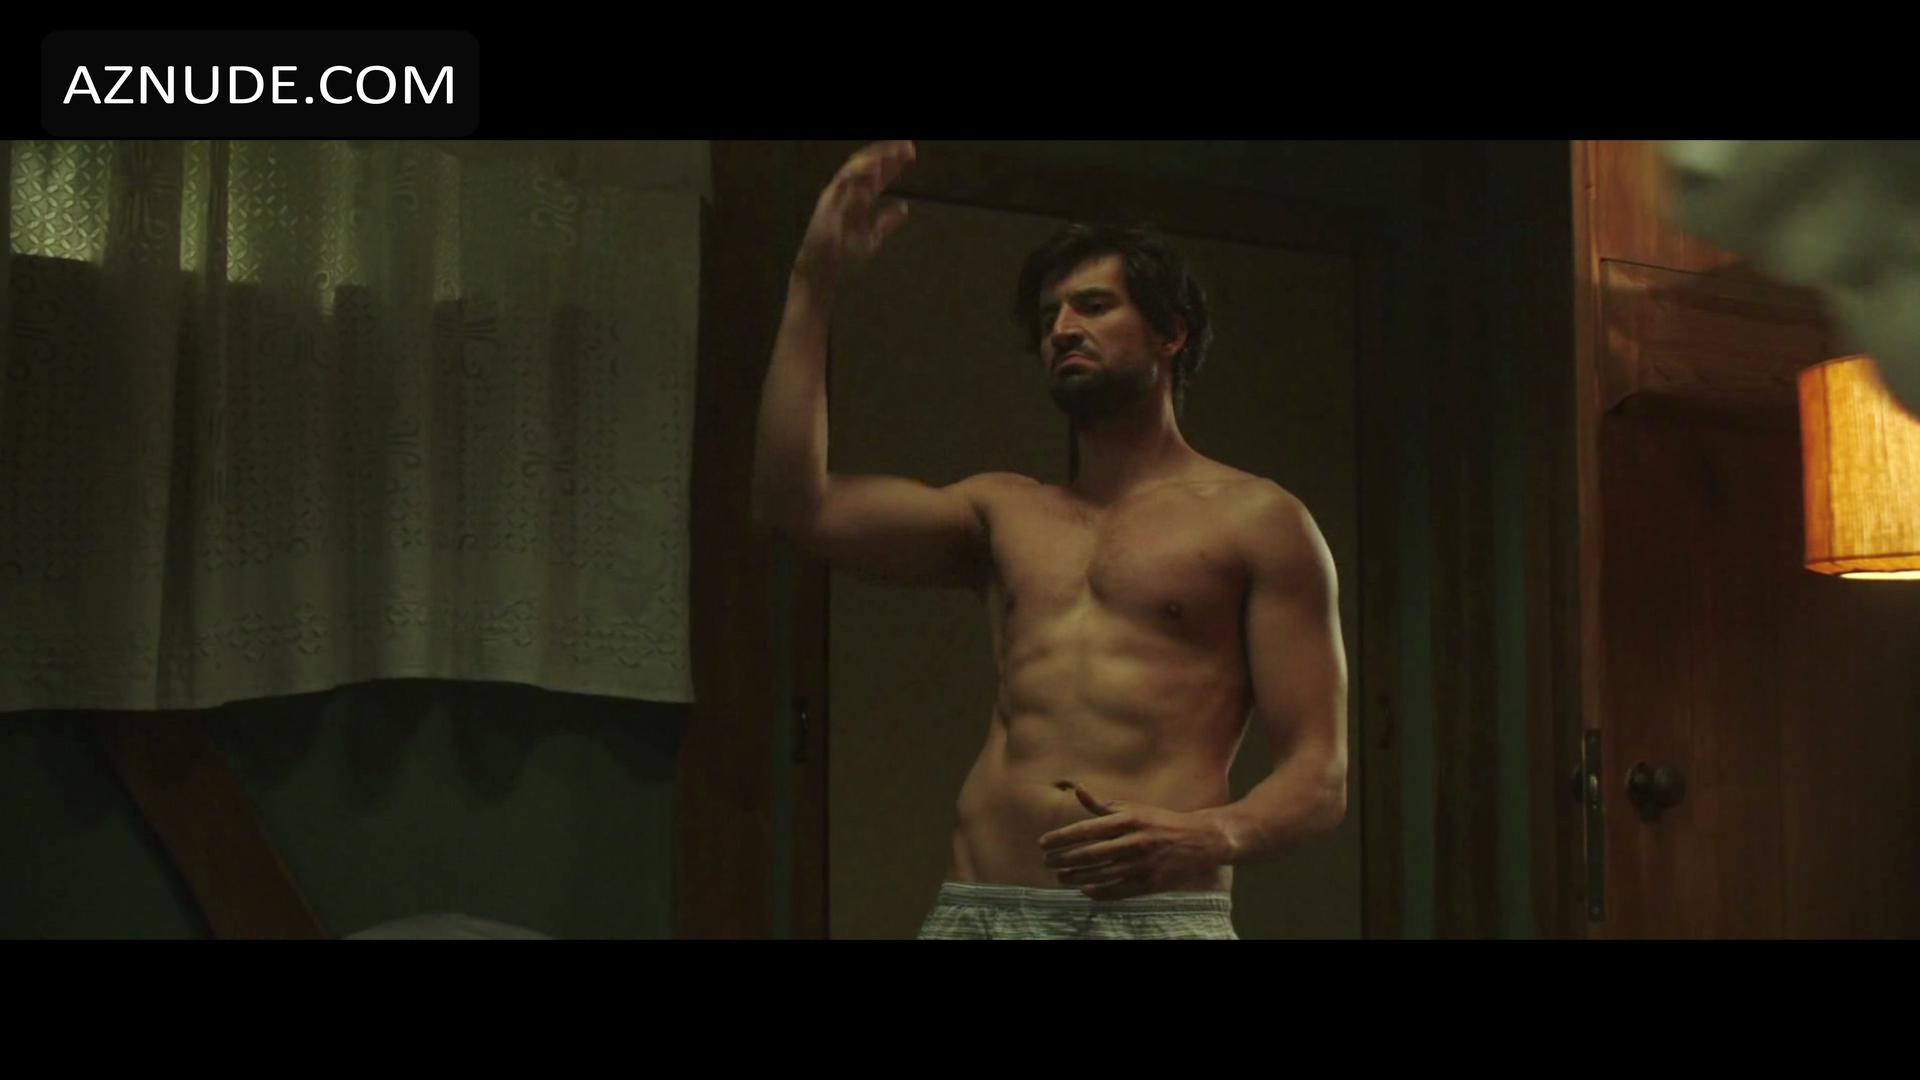 Tom beck nude